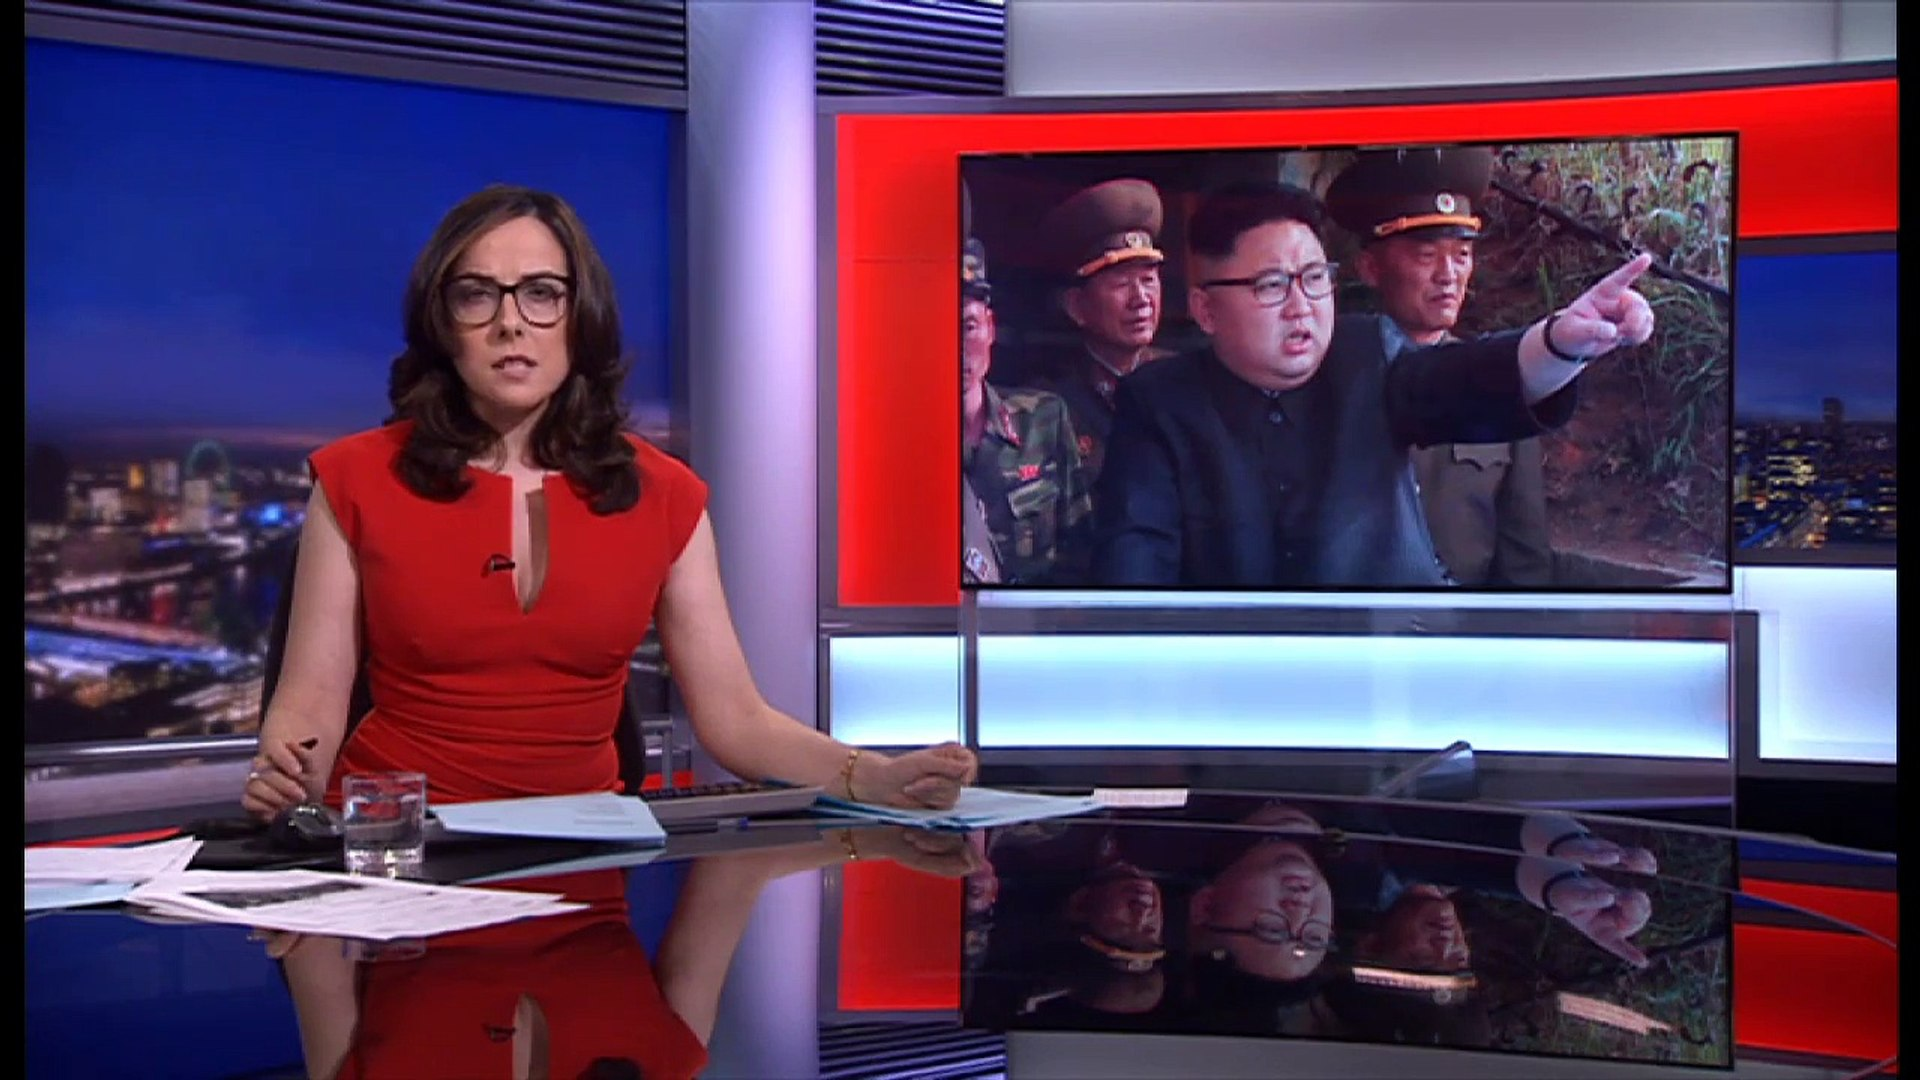 North Korea Live Interview - Australia_Asia Midday BBC World News, BBC News Channel-7nmLH6GwqcU